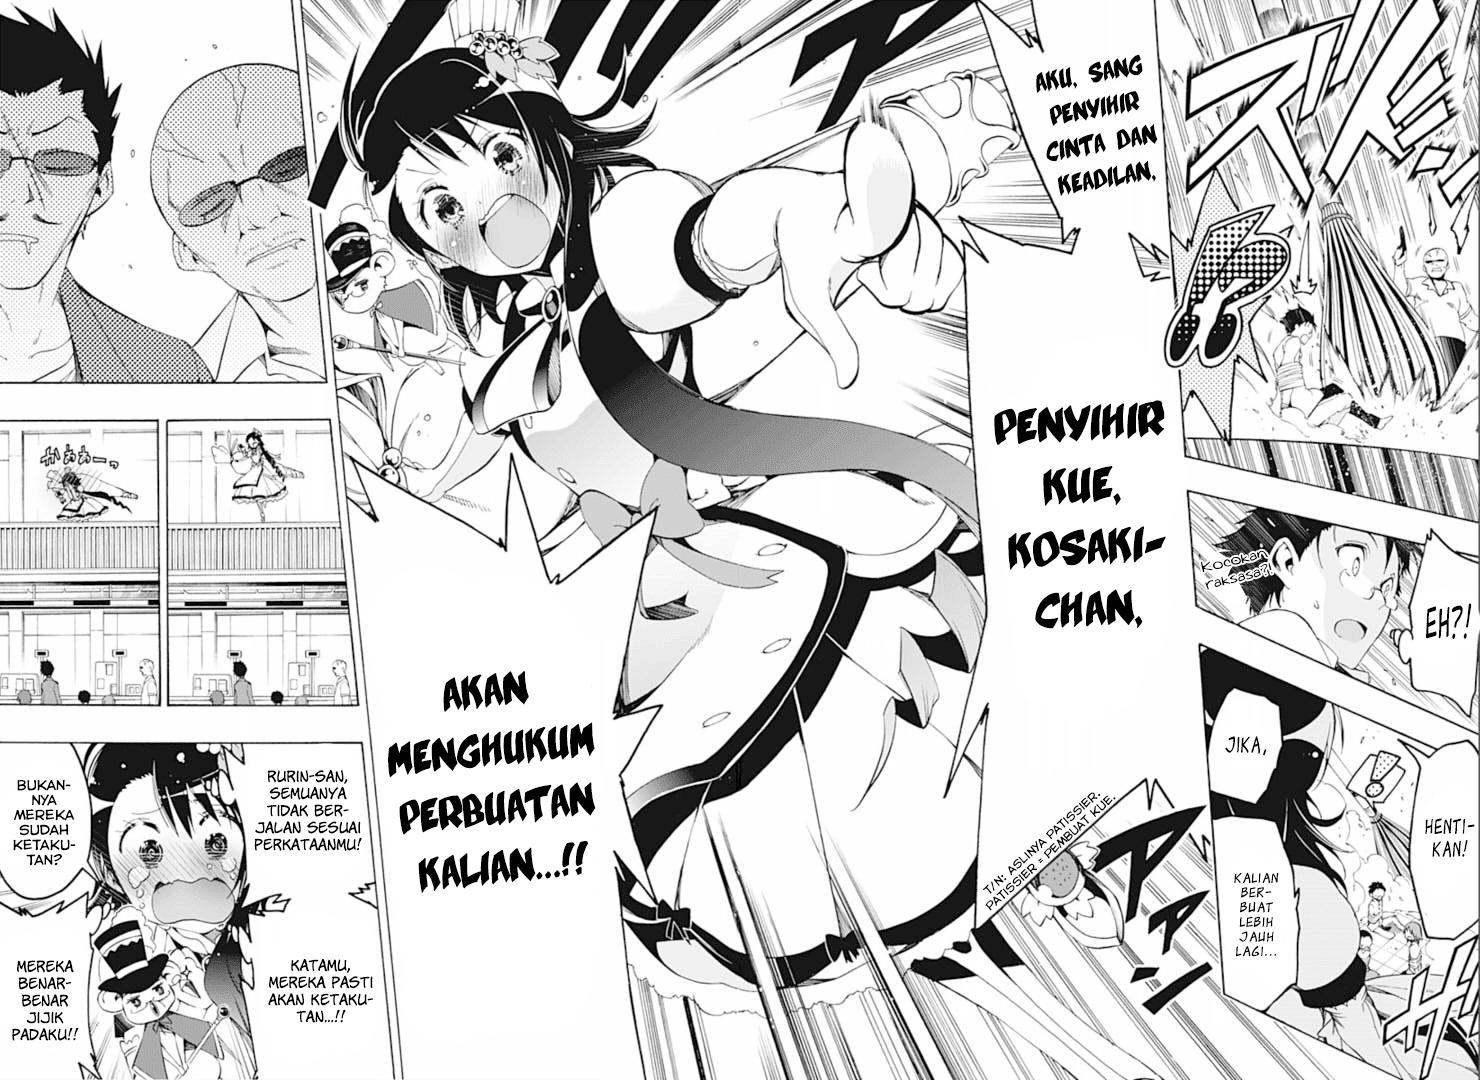 Dilarang COPAS - situs resmi www.mangacanblog.com - Komik magical patissier kosaki chan 001 - kontrak 2 Indonesia magical patissier kosaki chan 001 - kontrak Terbaru 21|Baca Manga Komik Indonesia|Mangacan